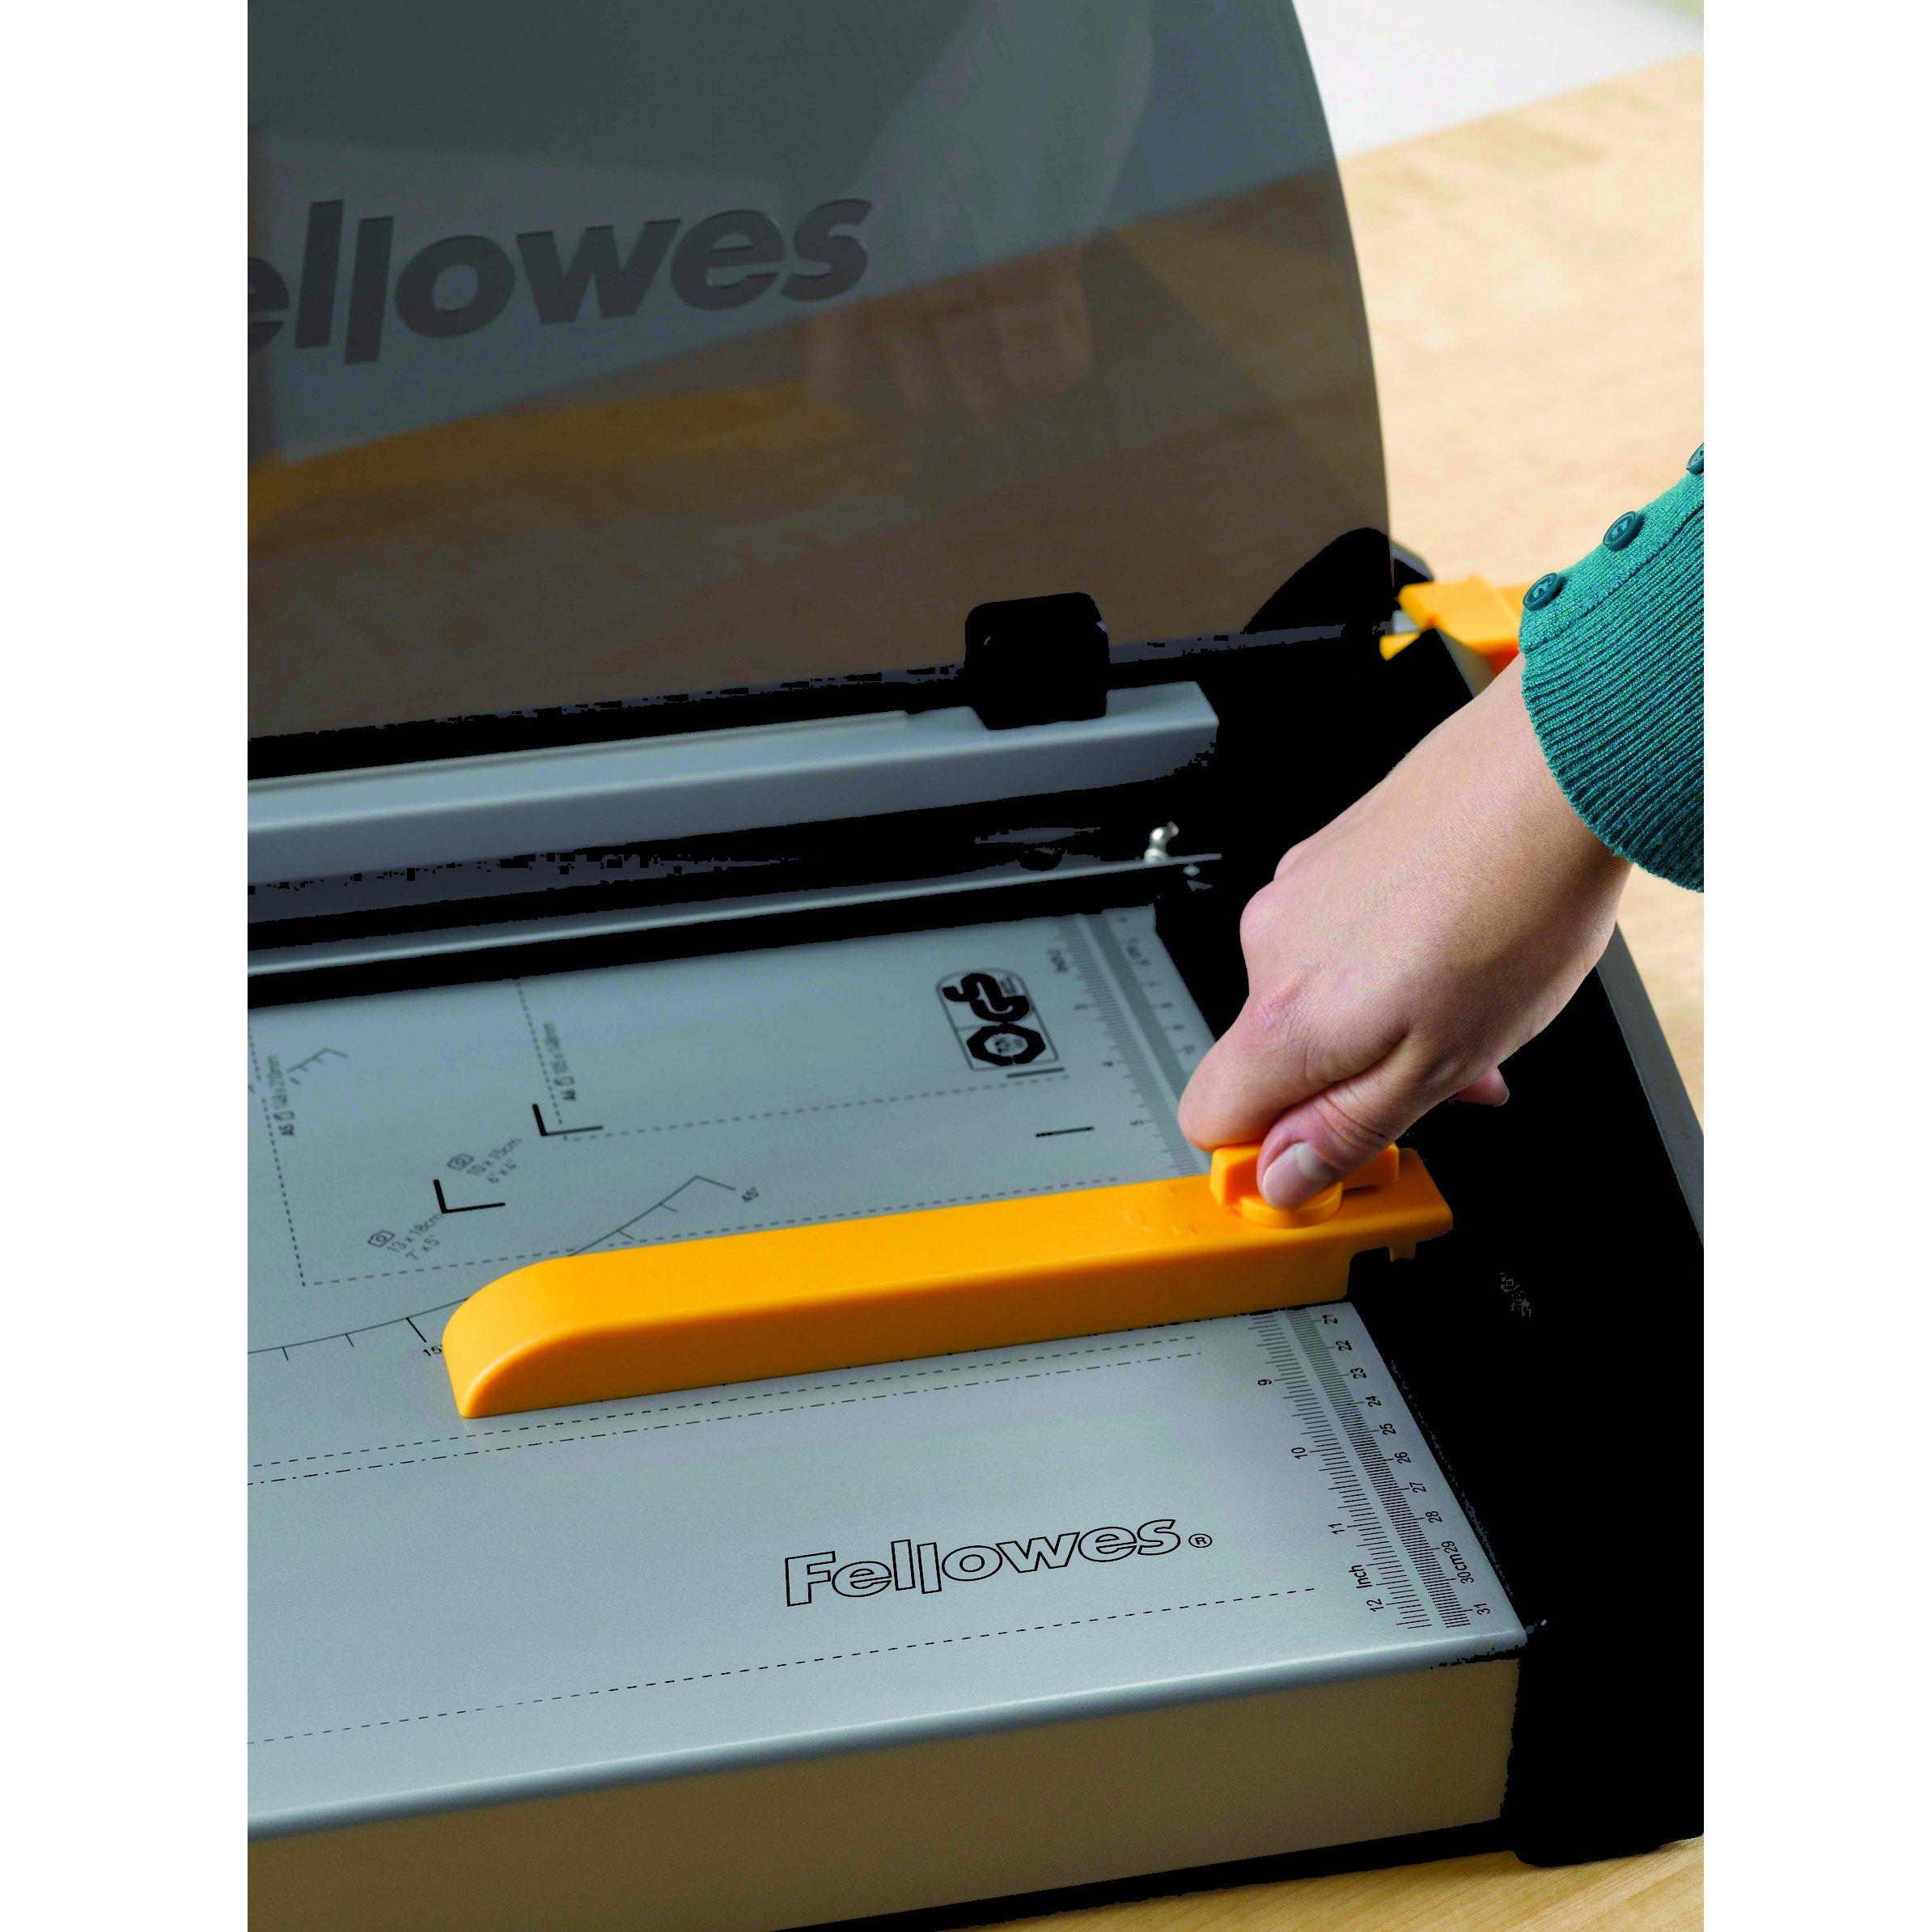 Fellowes Plasma 180 Paper Cutter, Black/Silver (5411102)